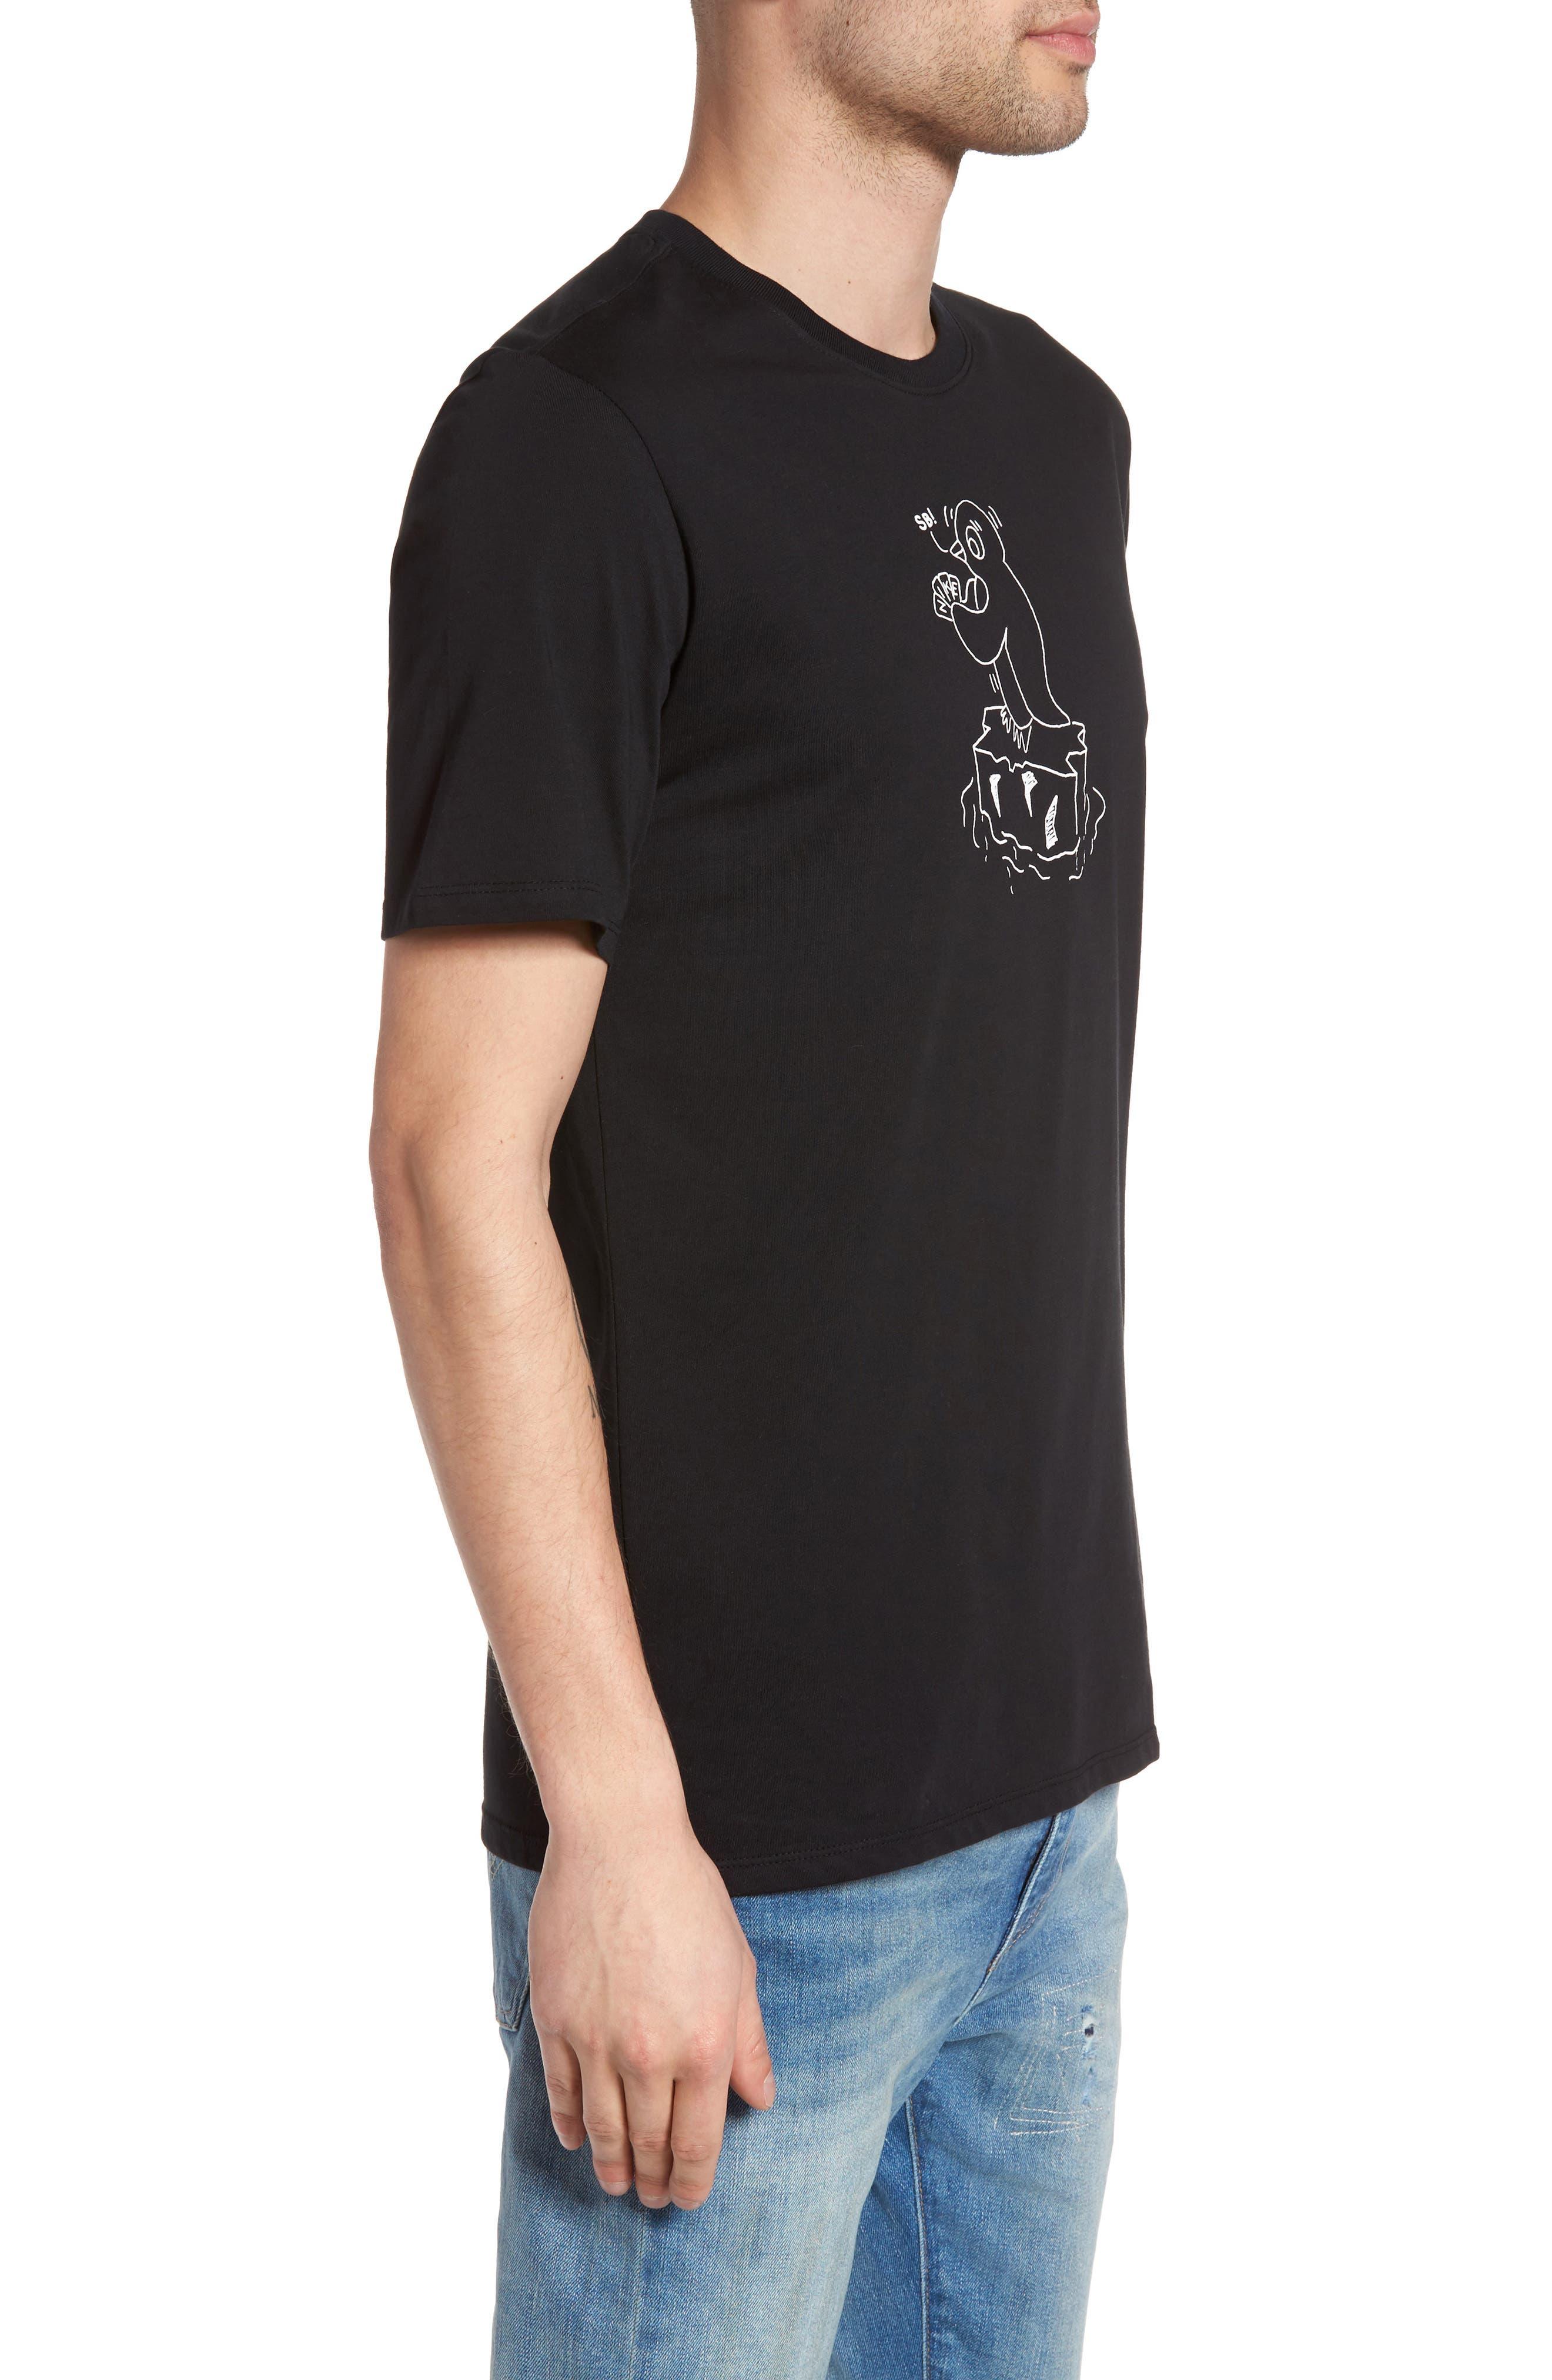 Penguin T-Shirt,                             Alternate thumbnail 3, color,                             010